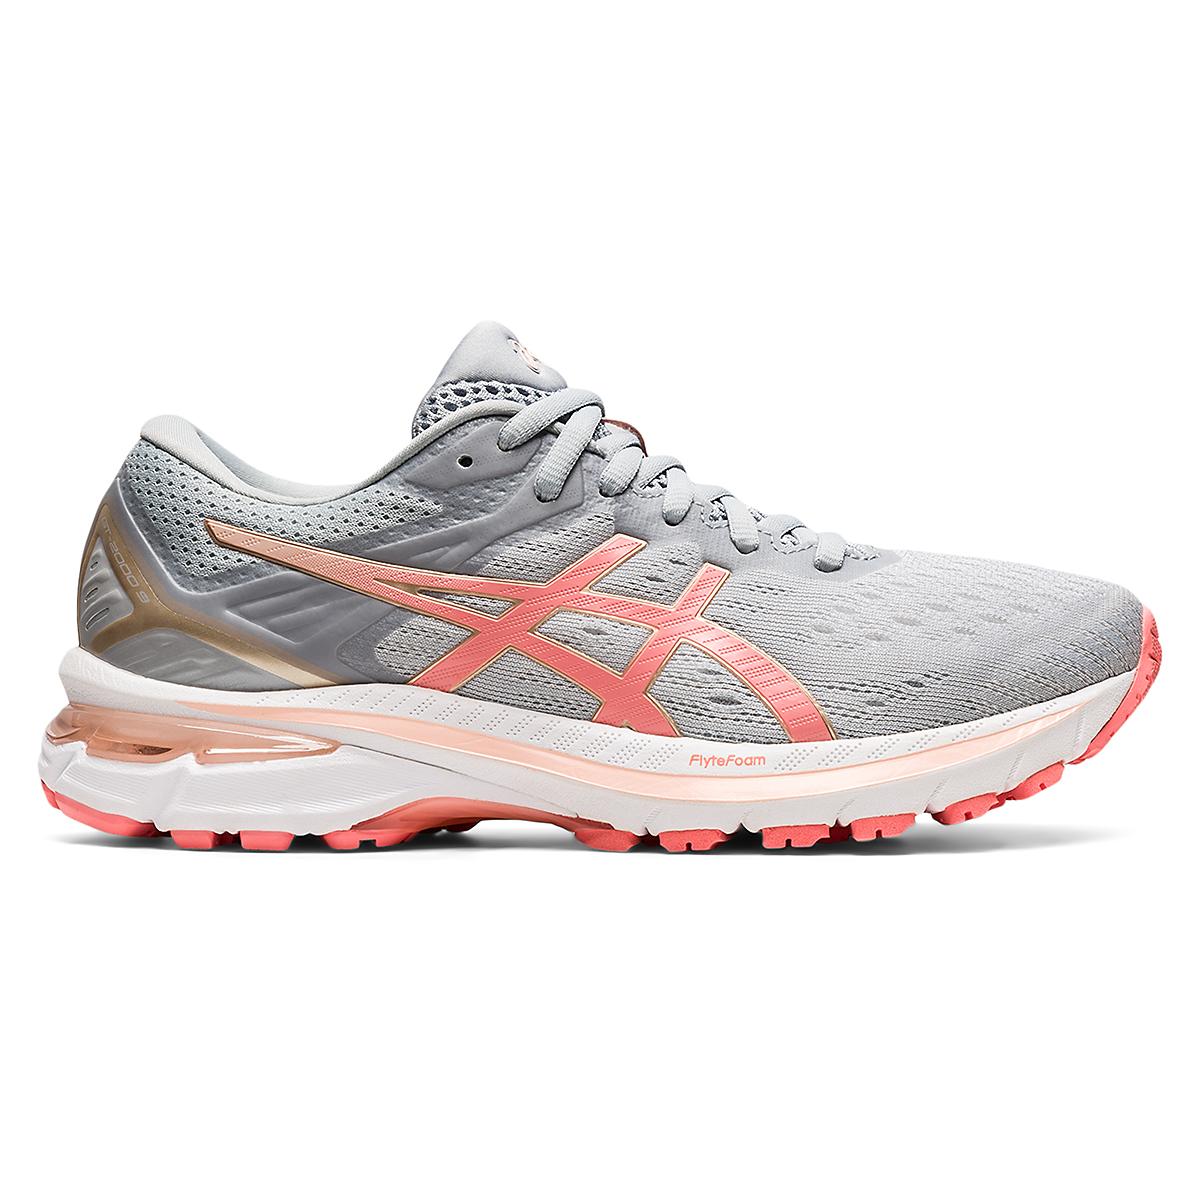 Women's Asics Gt-2000 9 Running Shoe - Color: Piedmont Grey - Size: 5 - Width: Regular, Piedmont Grey, large, image 1